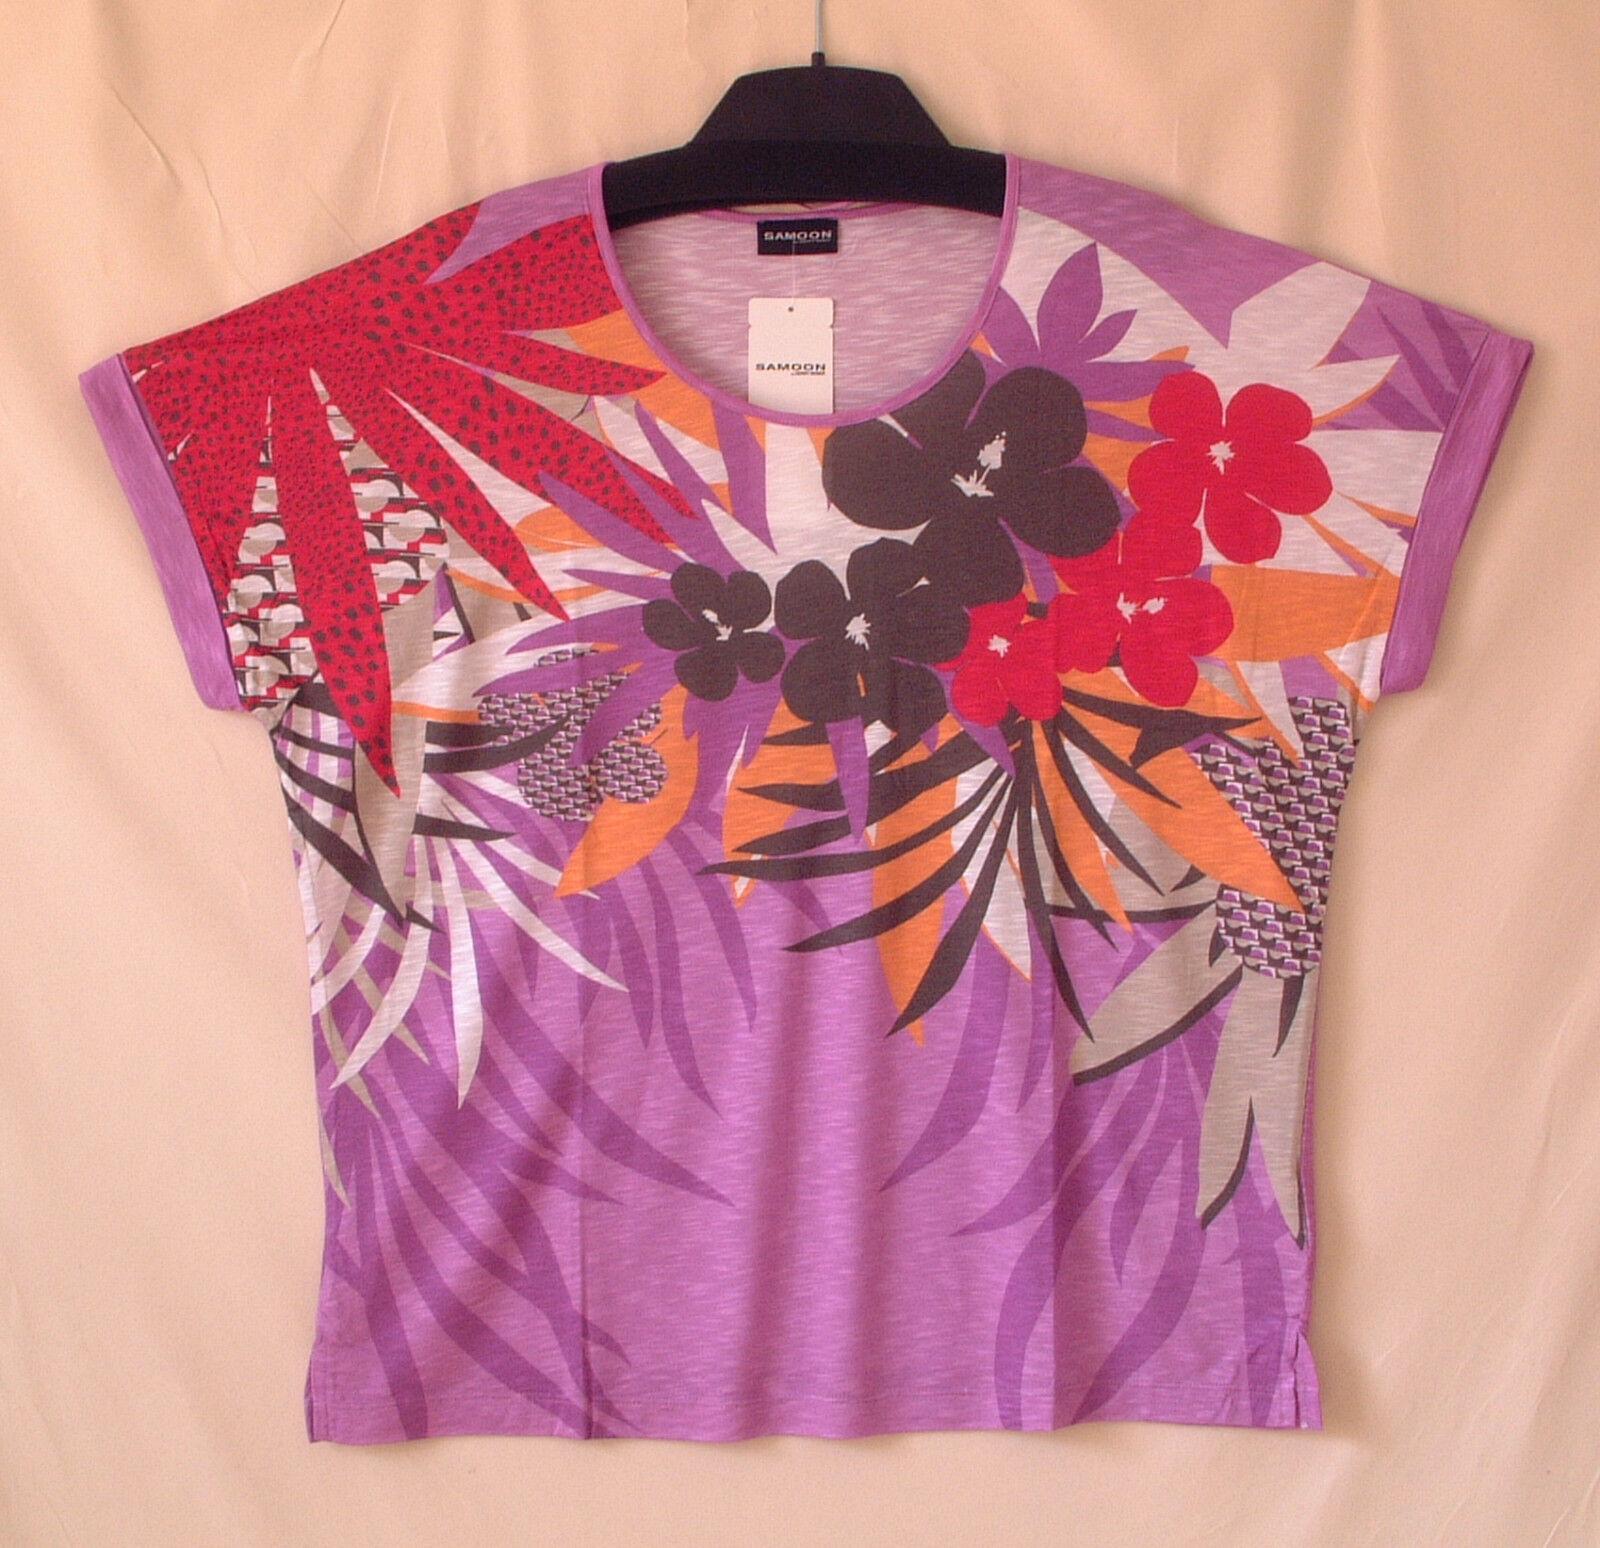 Samoon Shirt Gerry Weber Rundhals superleichte Viskose Qualität Neu Damen Gr.46